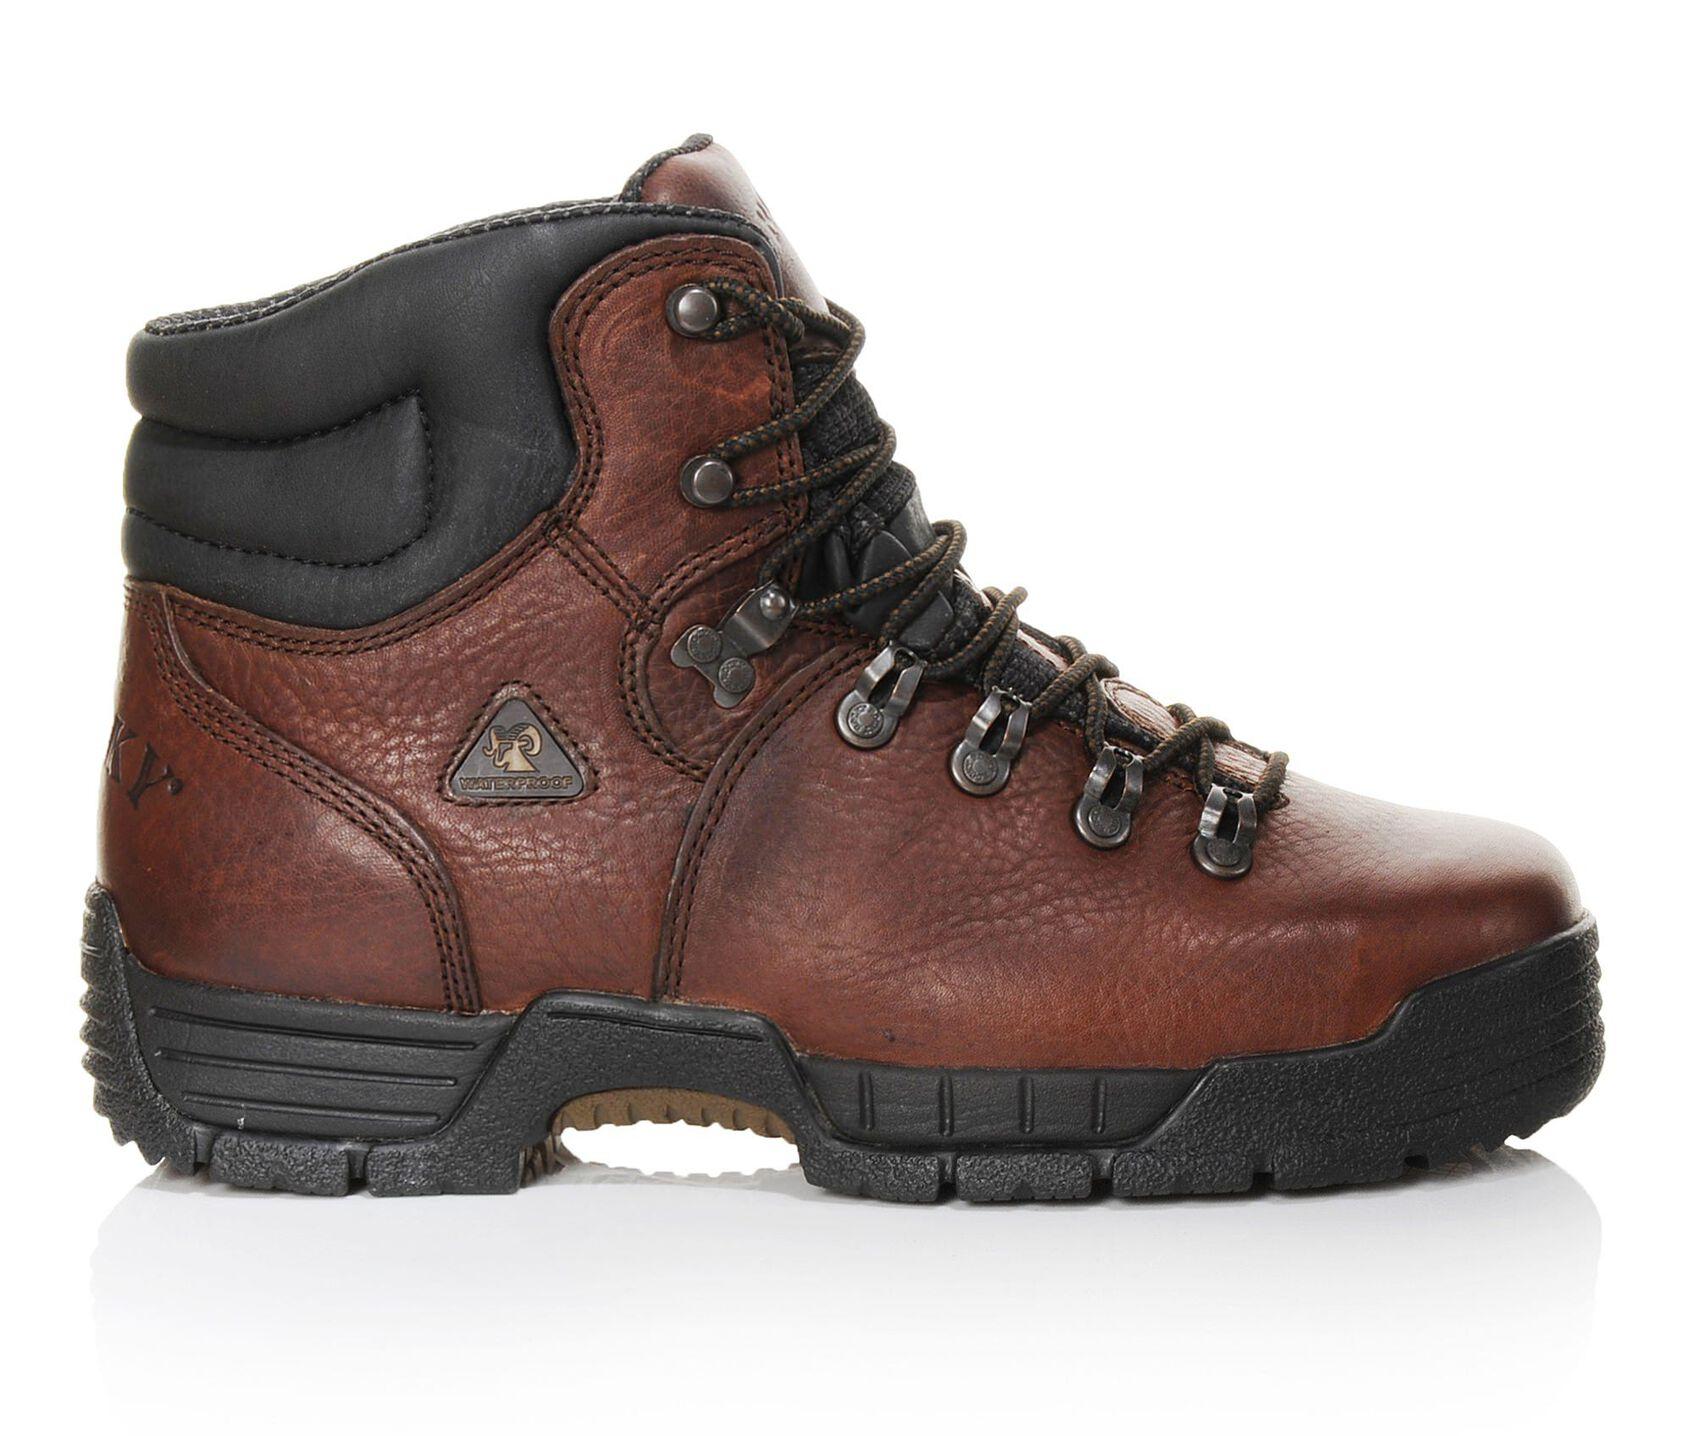 b5685630e59 Men's Rocky Mobilite 6 In Steel Toe 6114 Work Boots